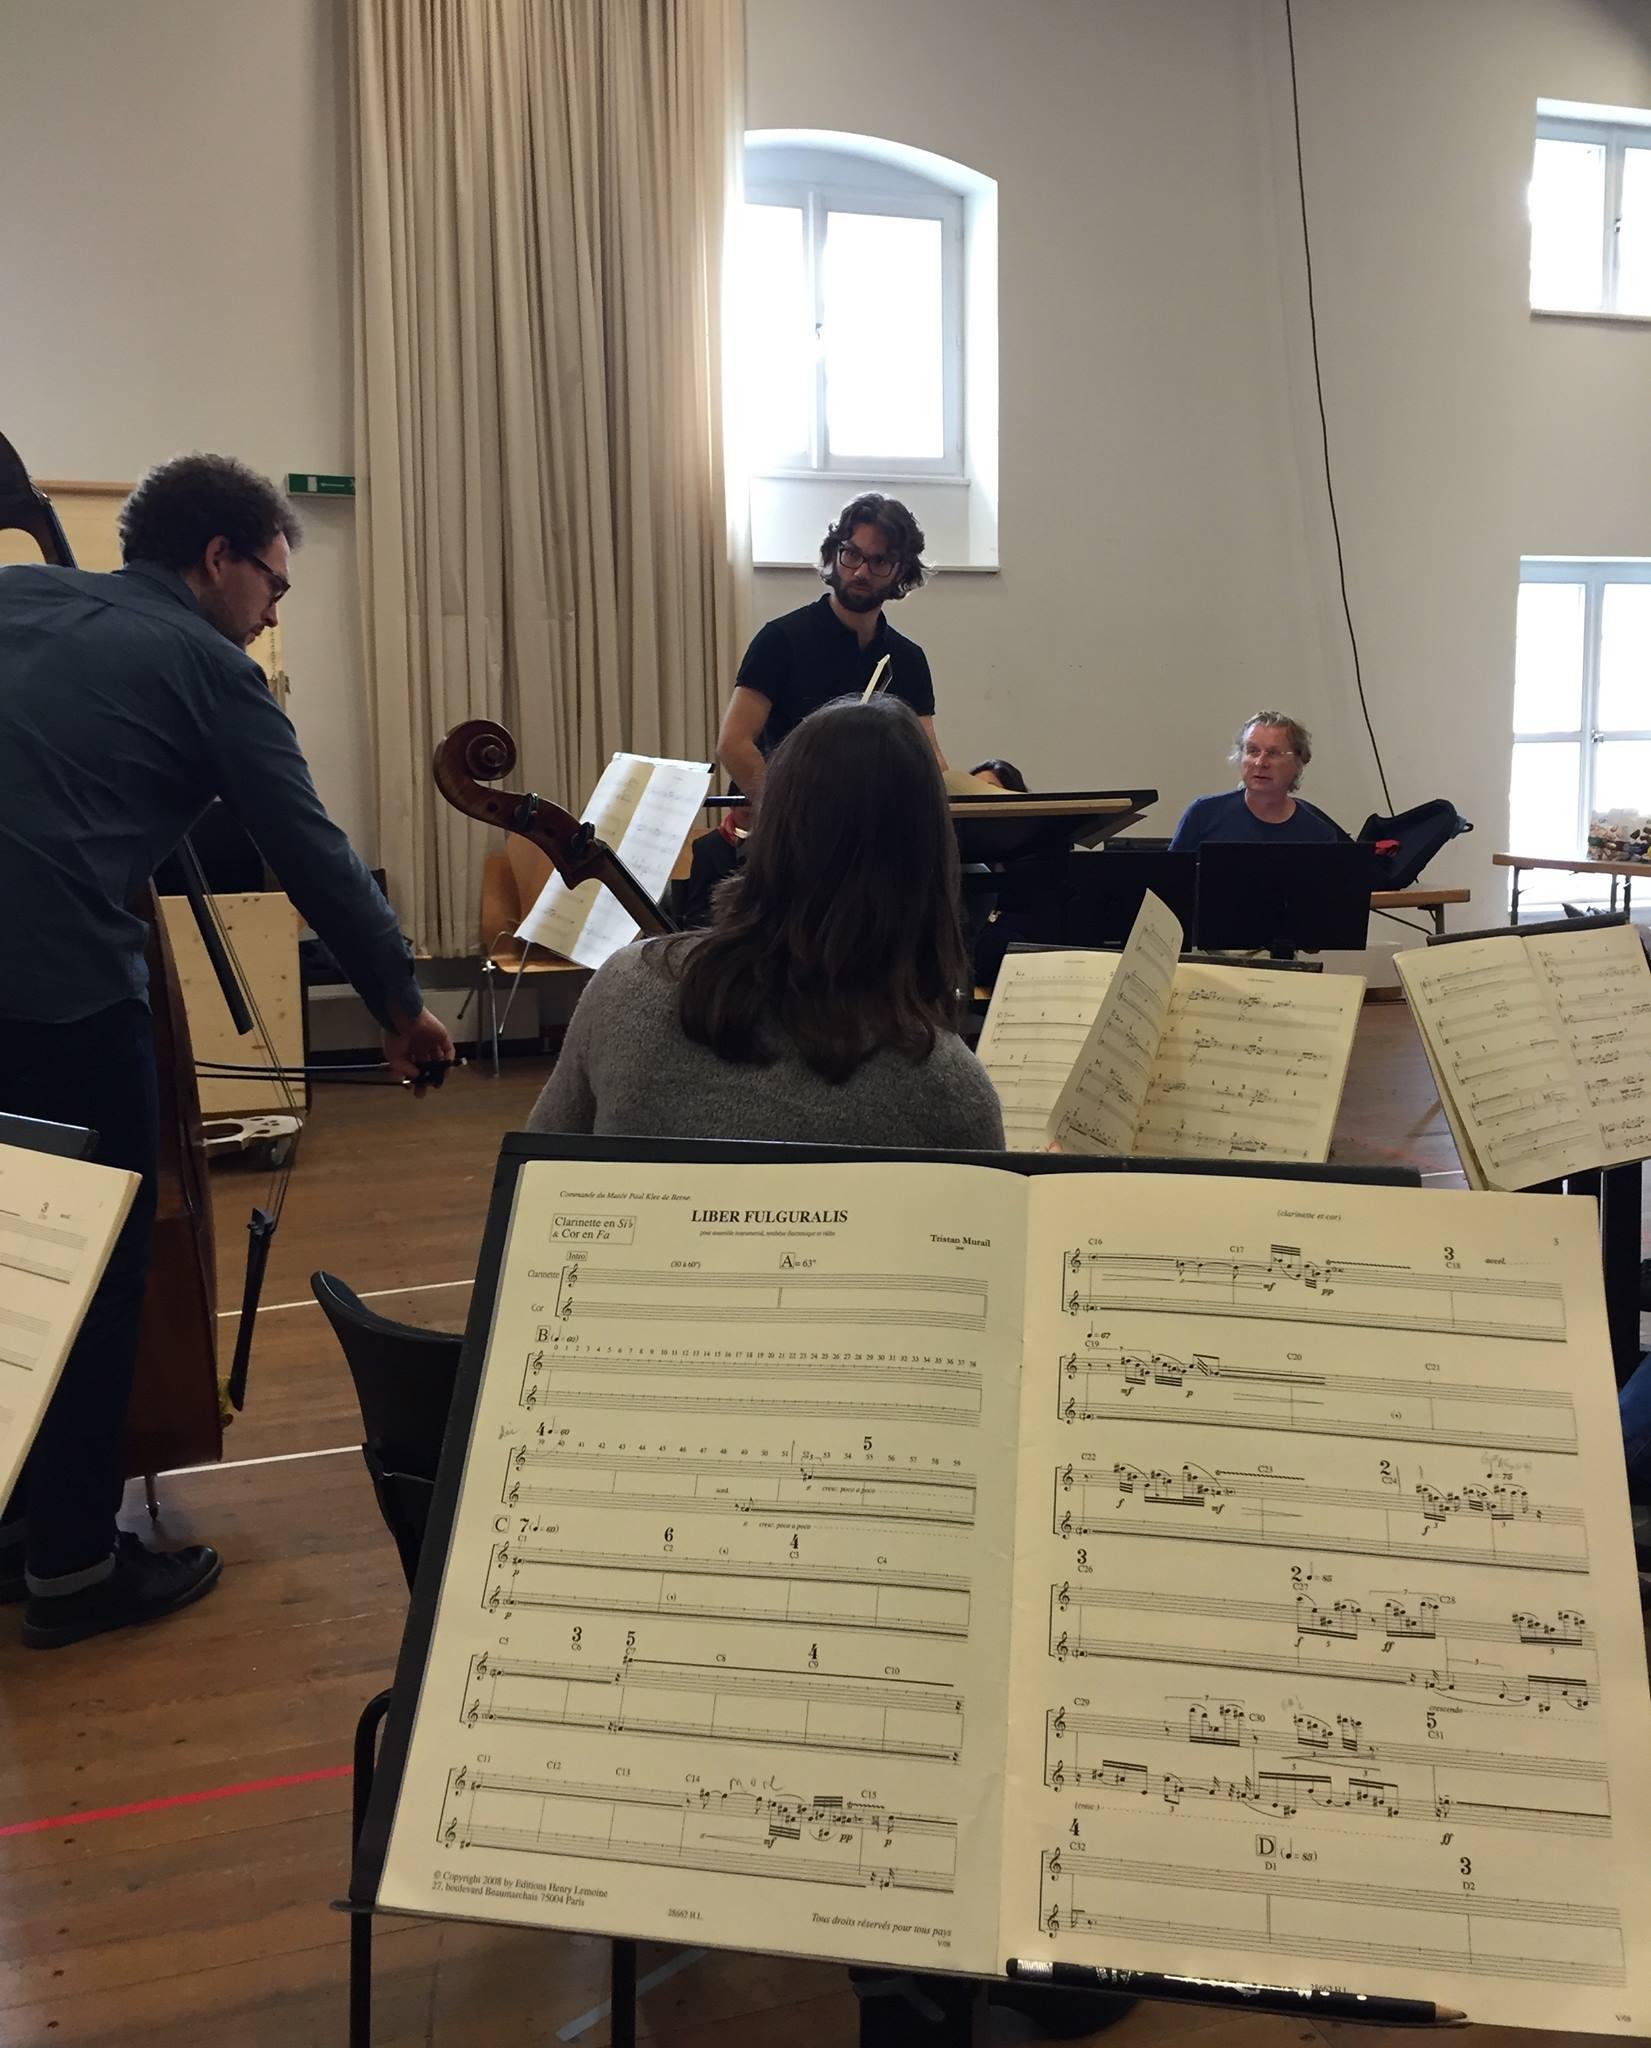 Salzburg, Austria | ICE Ensemble (NYC) & L'Itinéraire  Murail, Liber Fulguralis   June 2016